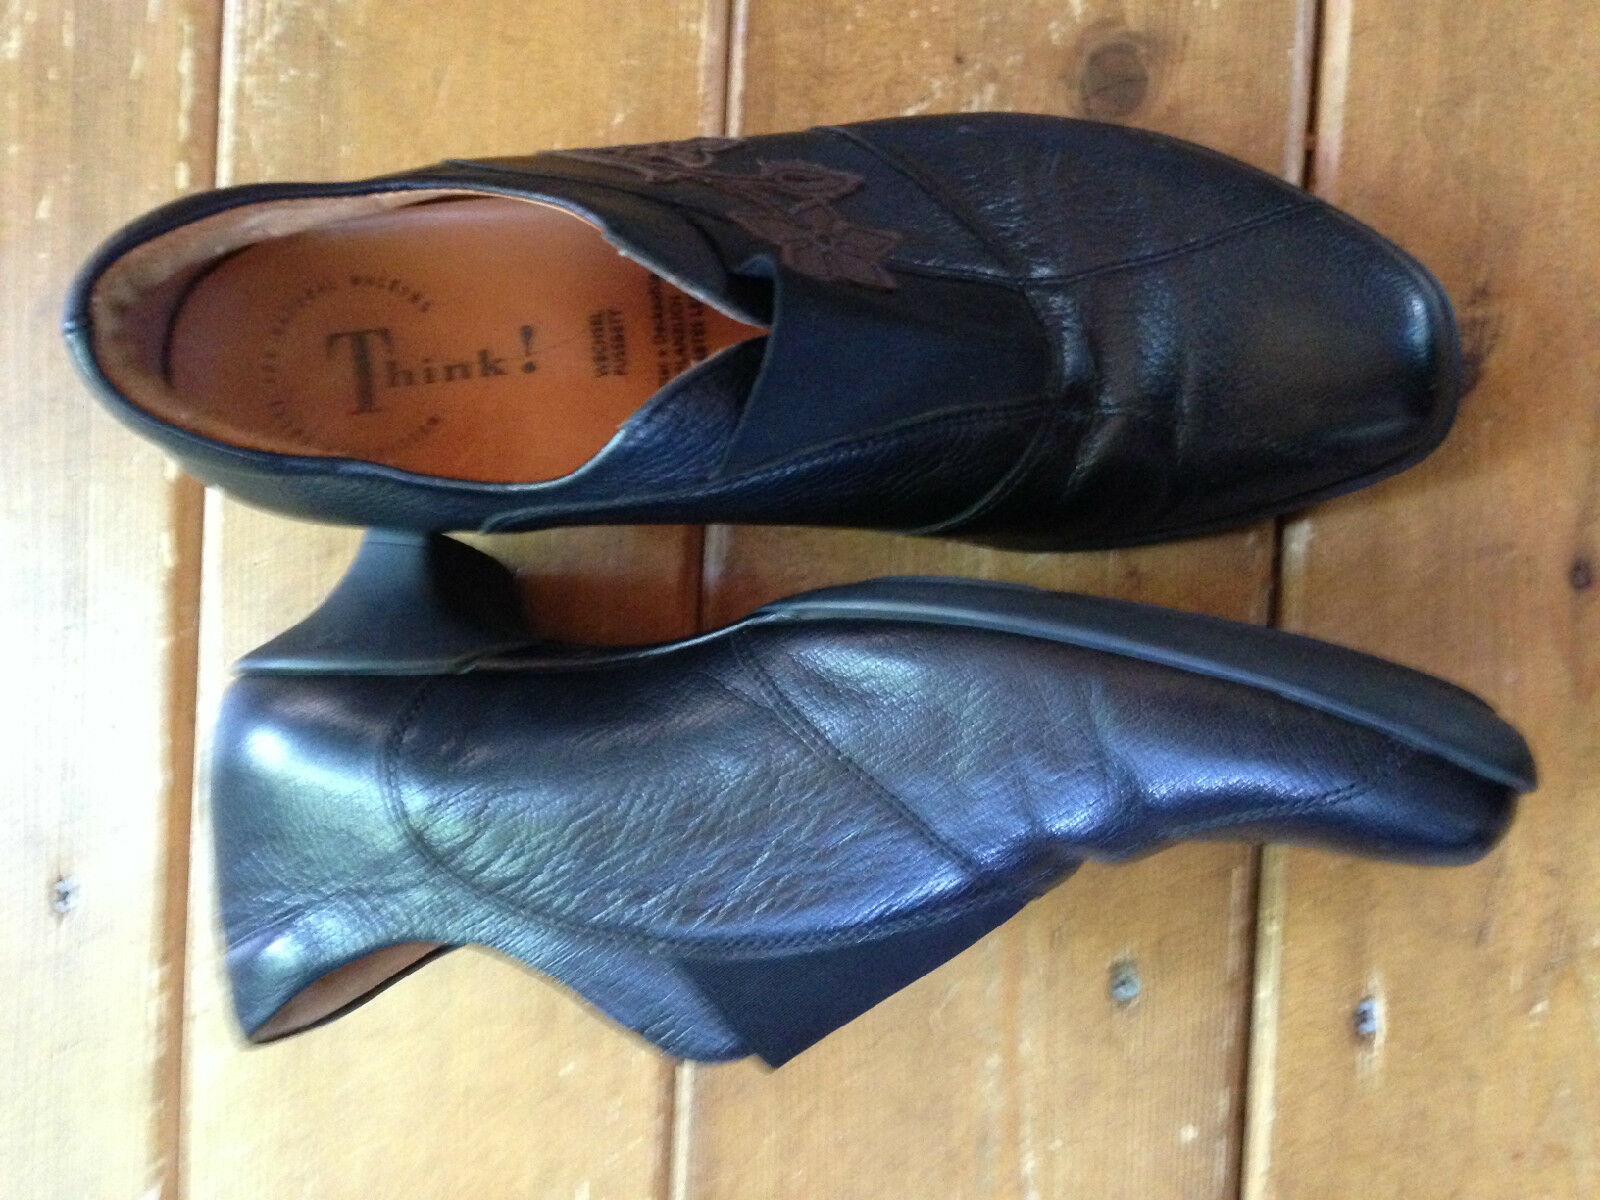 Zapatos Zapatos Zapatos De Cuero creo que 40 US 9-9.5 Para Mujer Negro  envío gratuito a nivel mundial